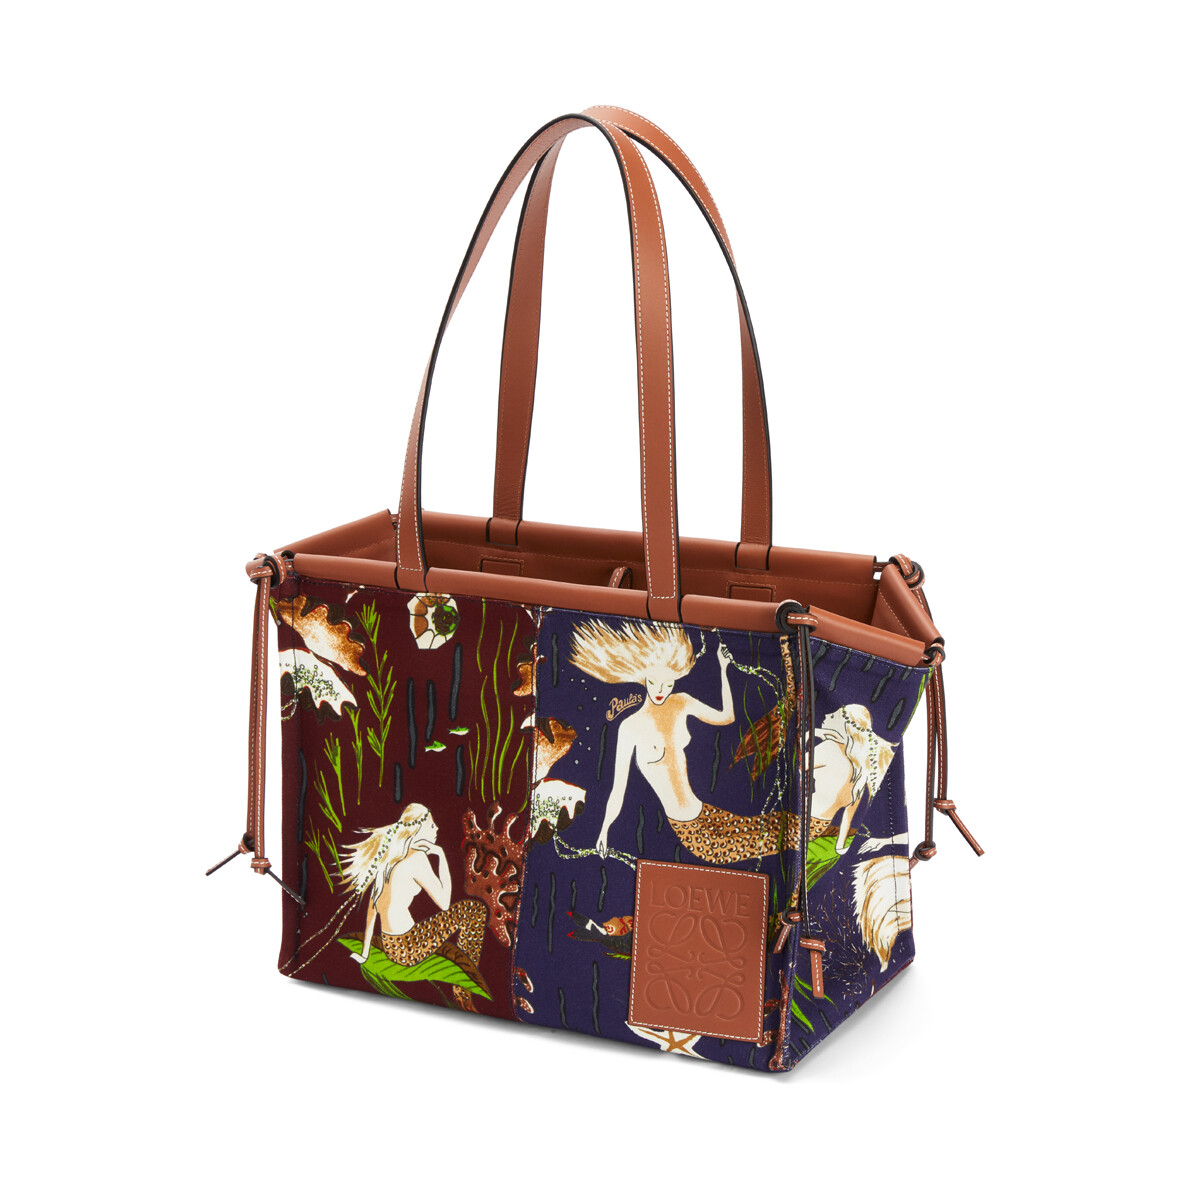 LOEWE Cushion Tote Bag In Mermaid Canvas And Calfskin Marine/Burgundy front